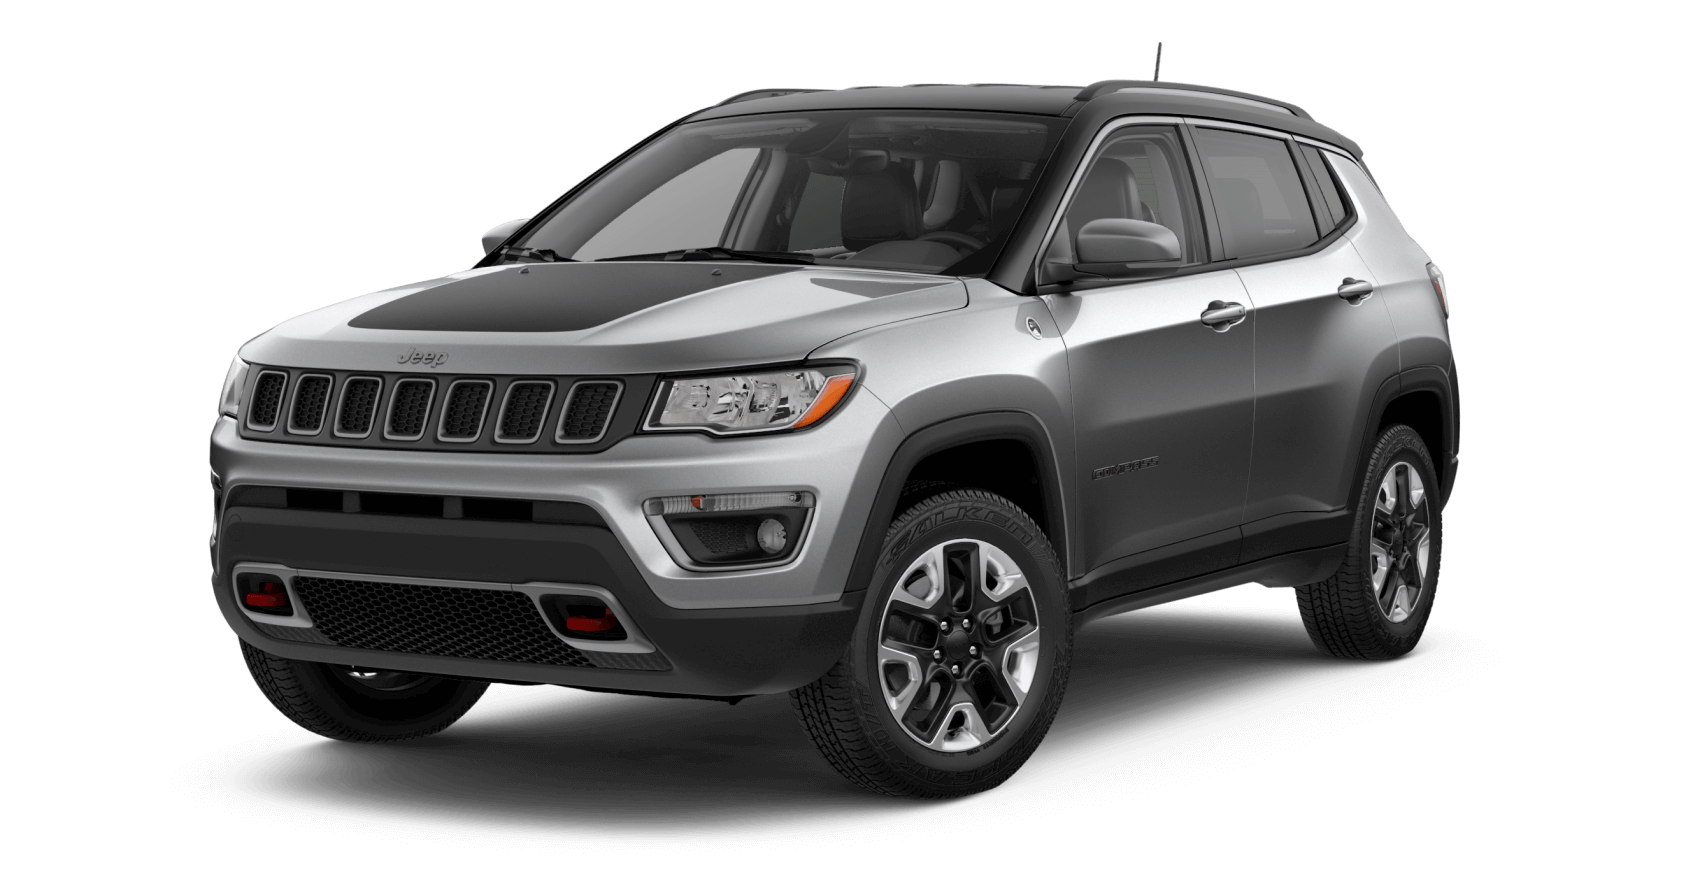 2021 Jeep Compass Silver